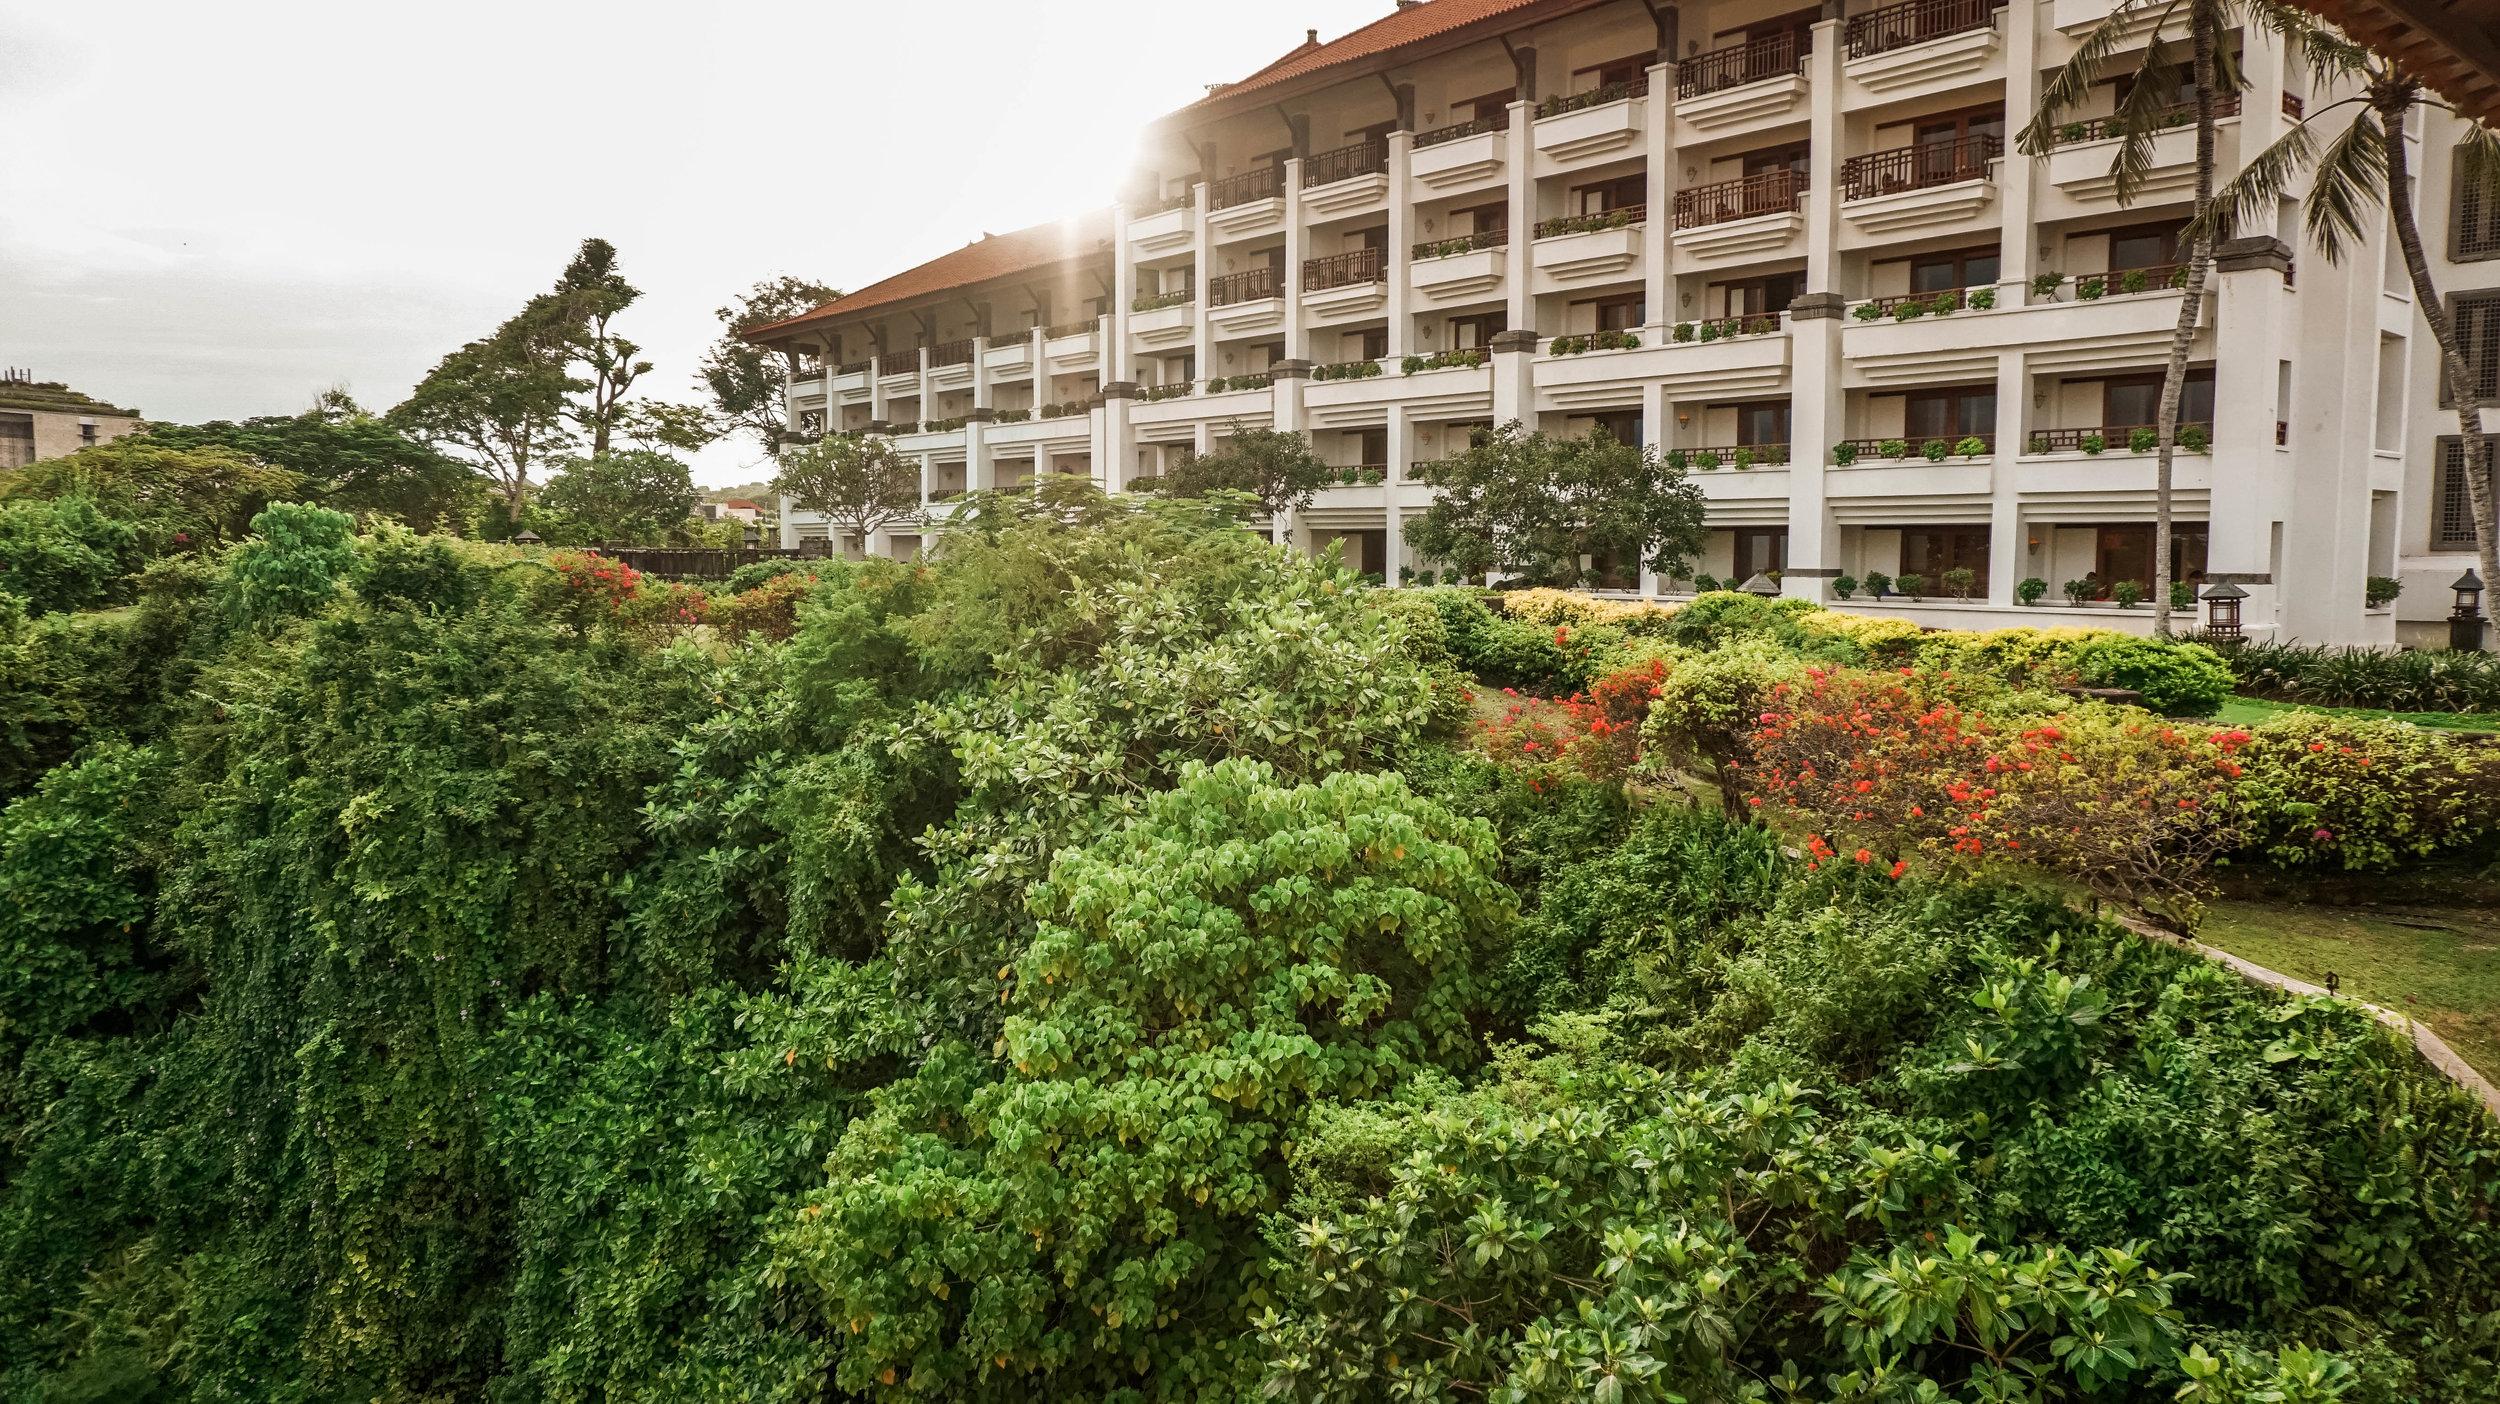 Hilton-bali-resort-grounds-2018.jpg